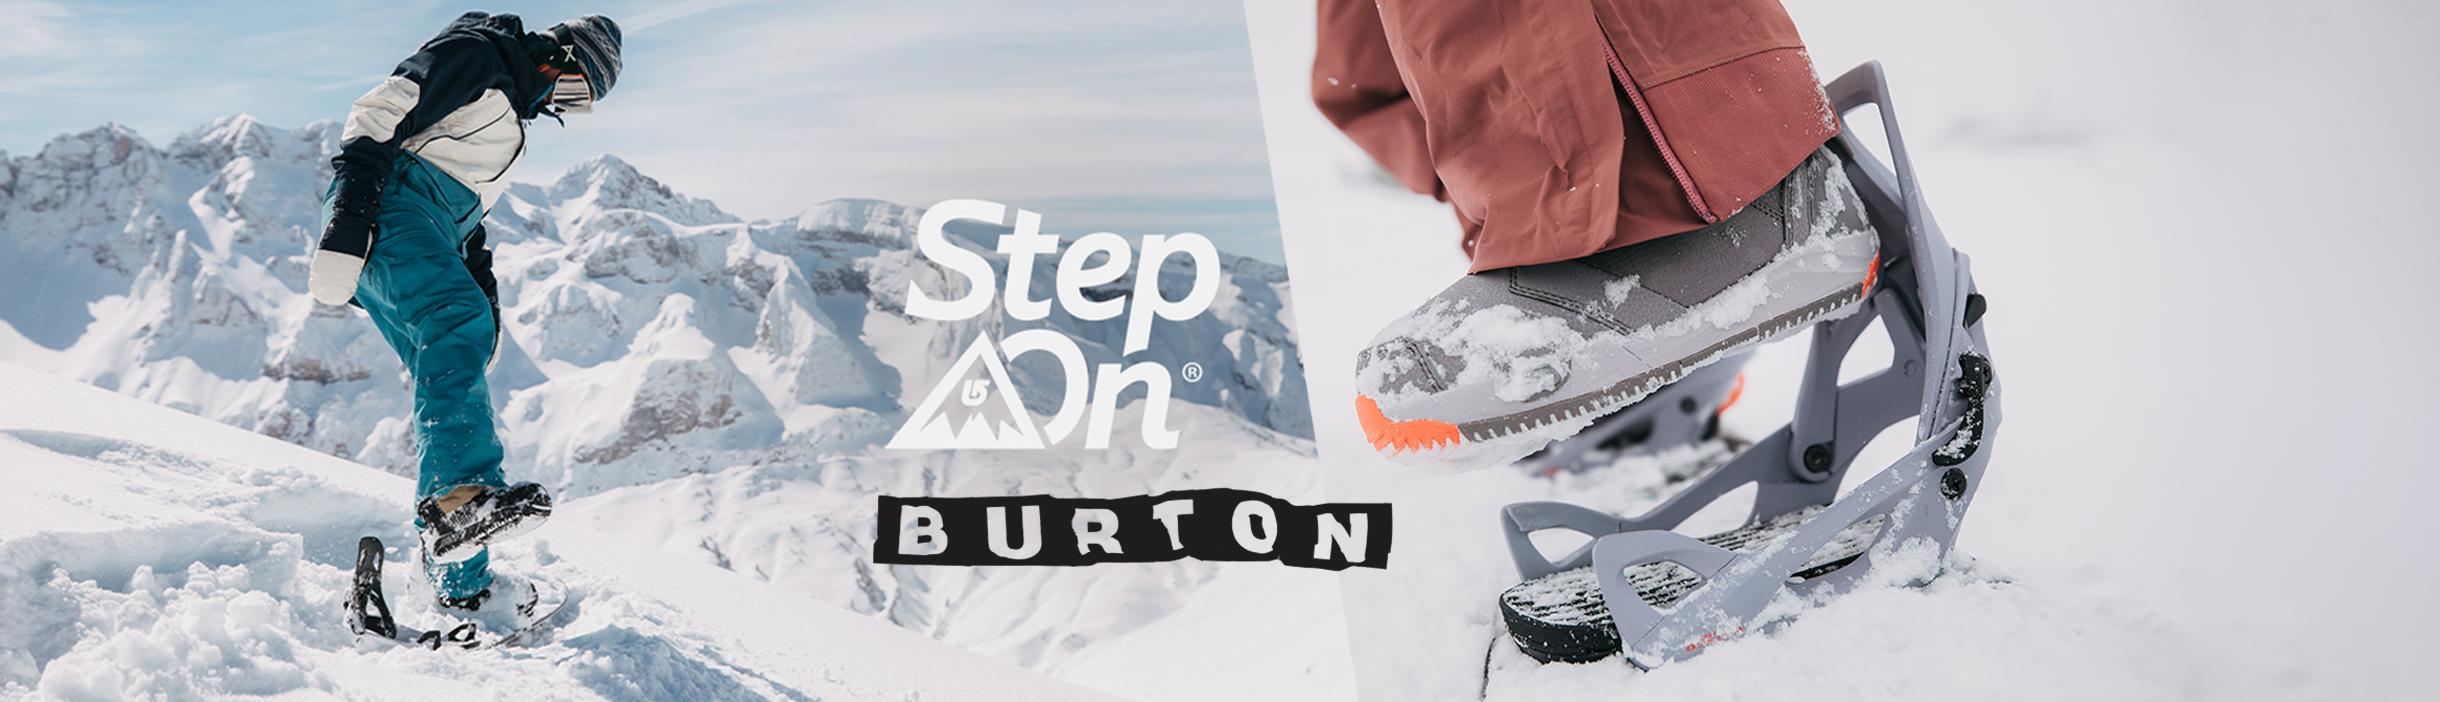 The Old Man - Burton - Step On